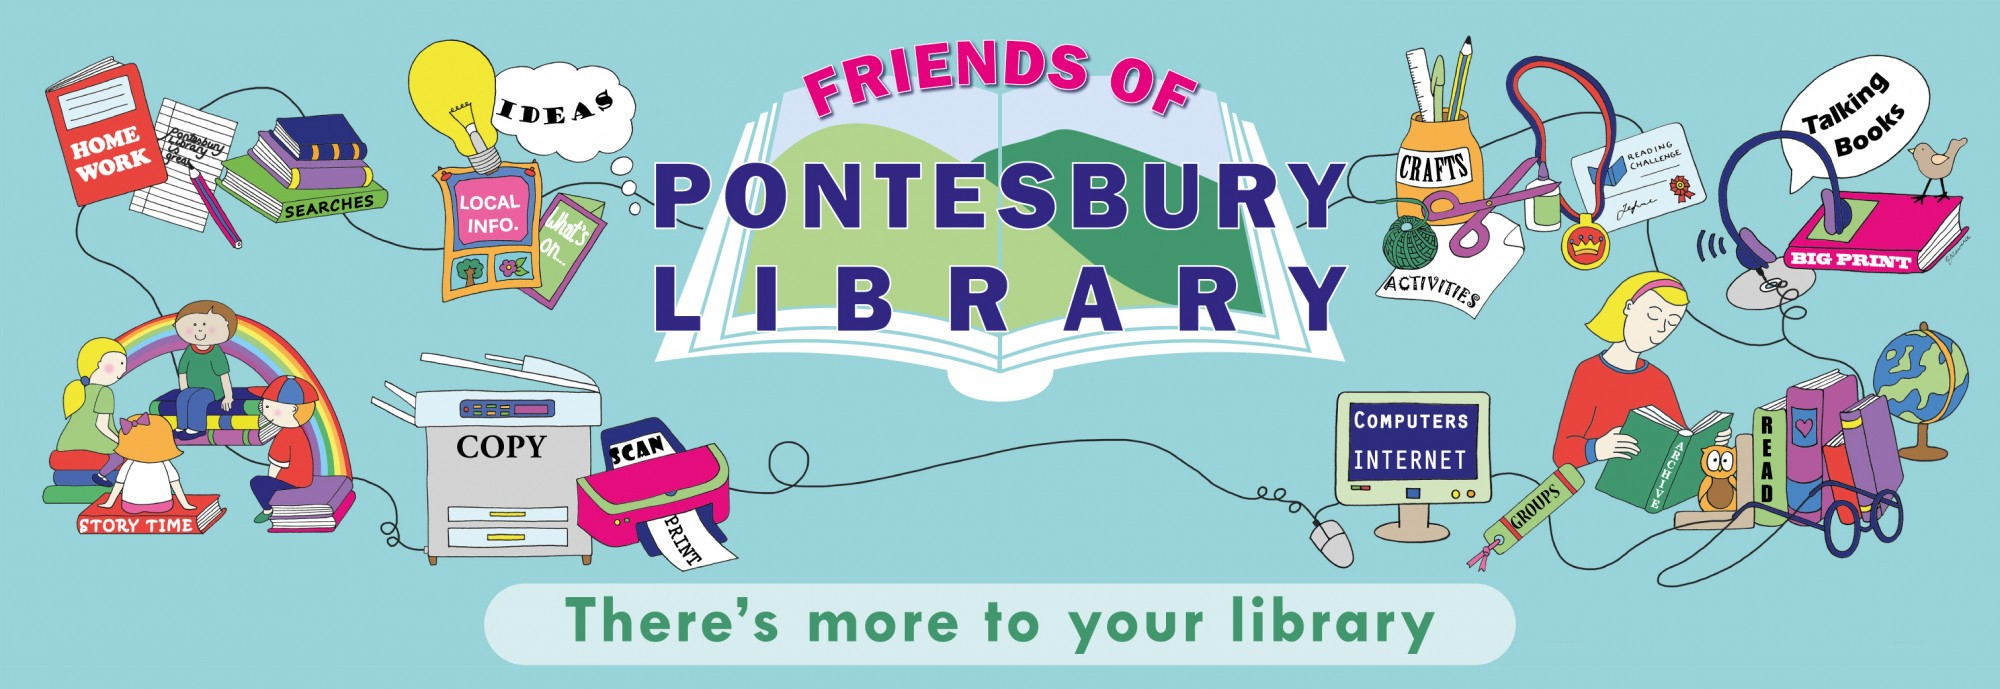 Pontesbury Library